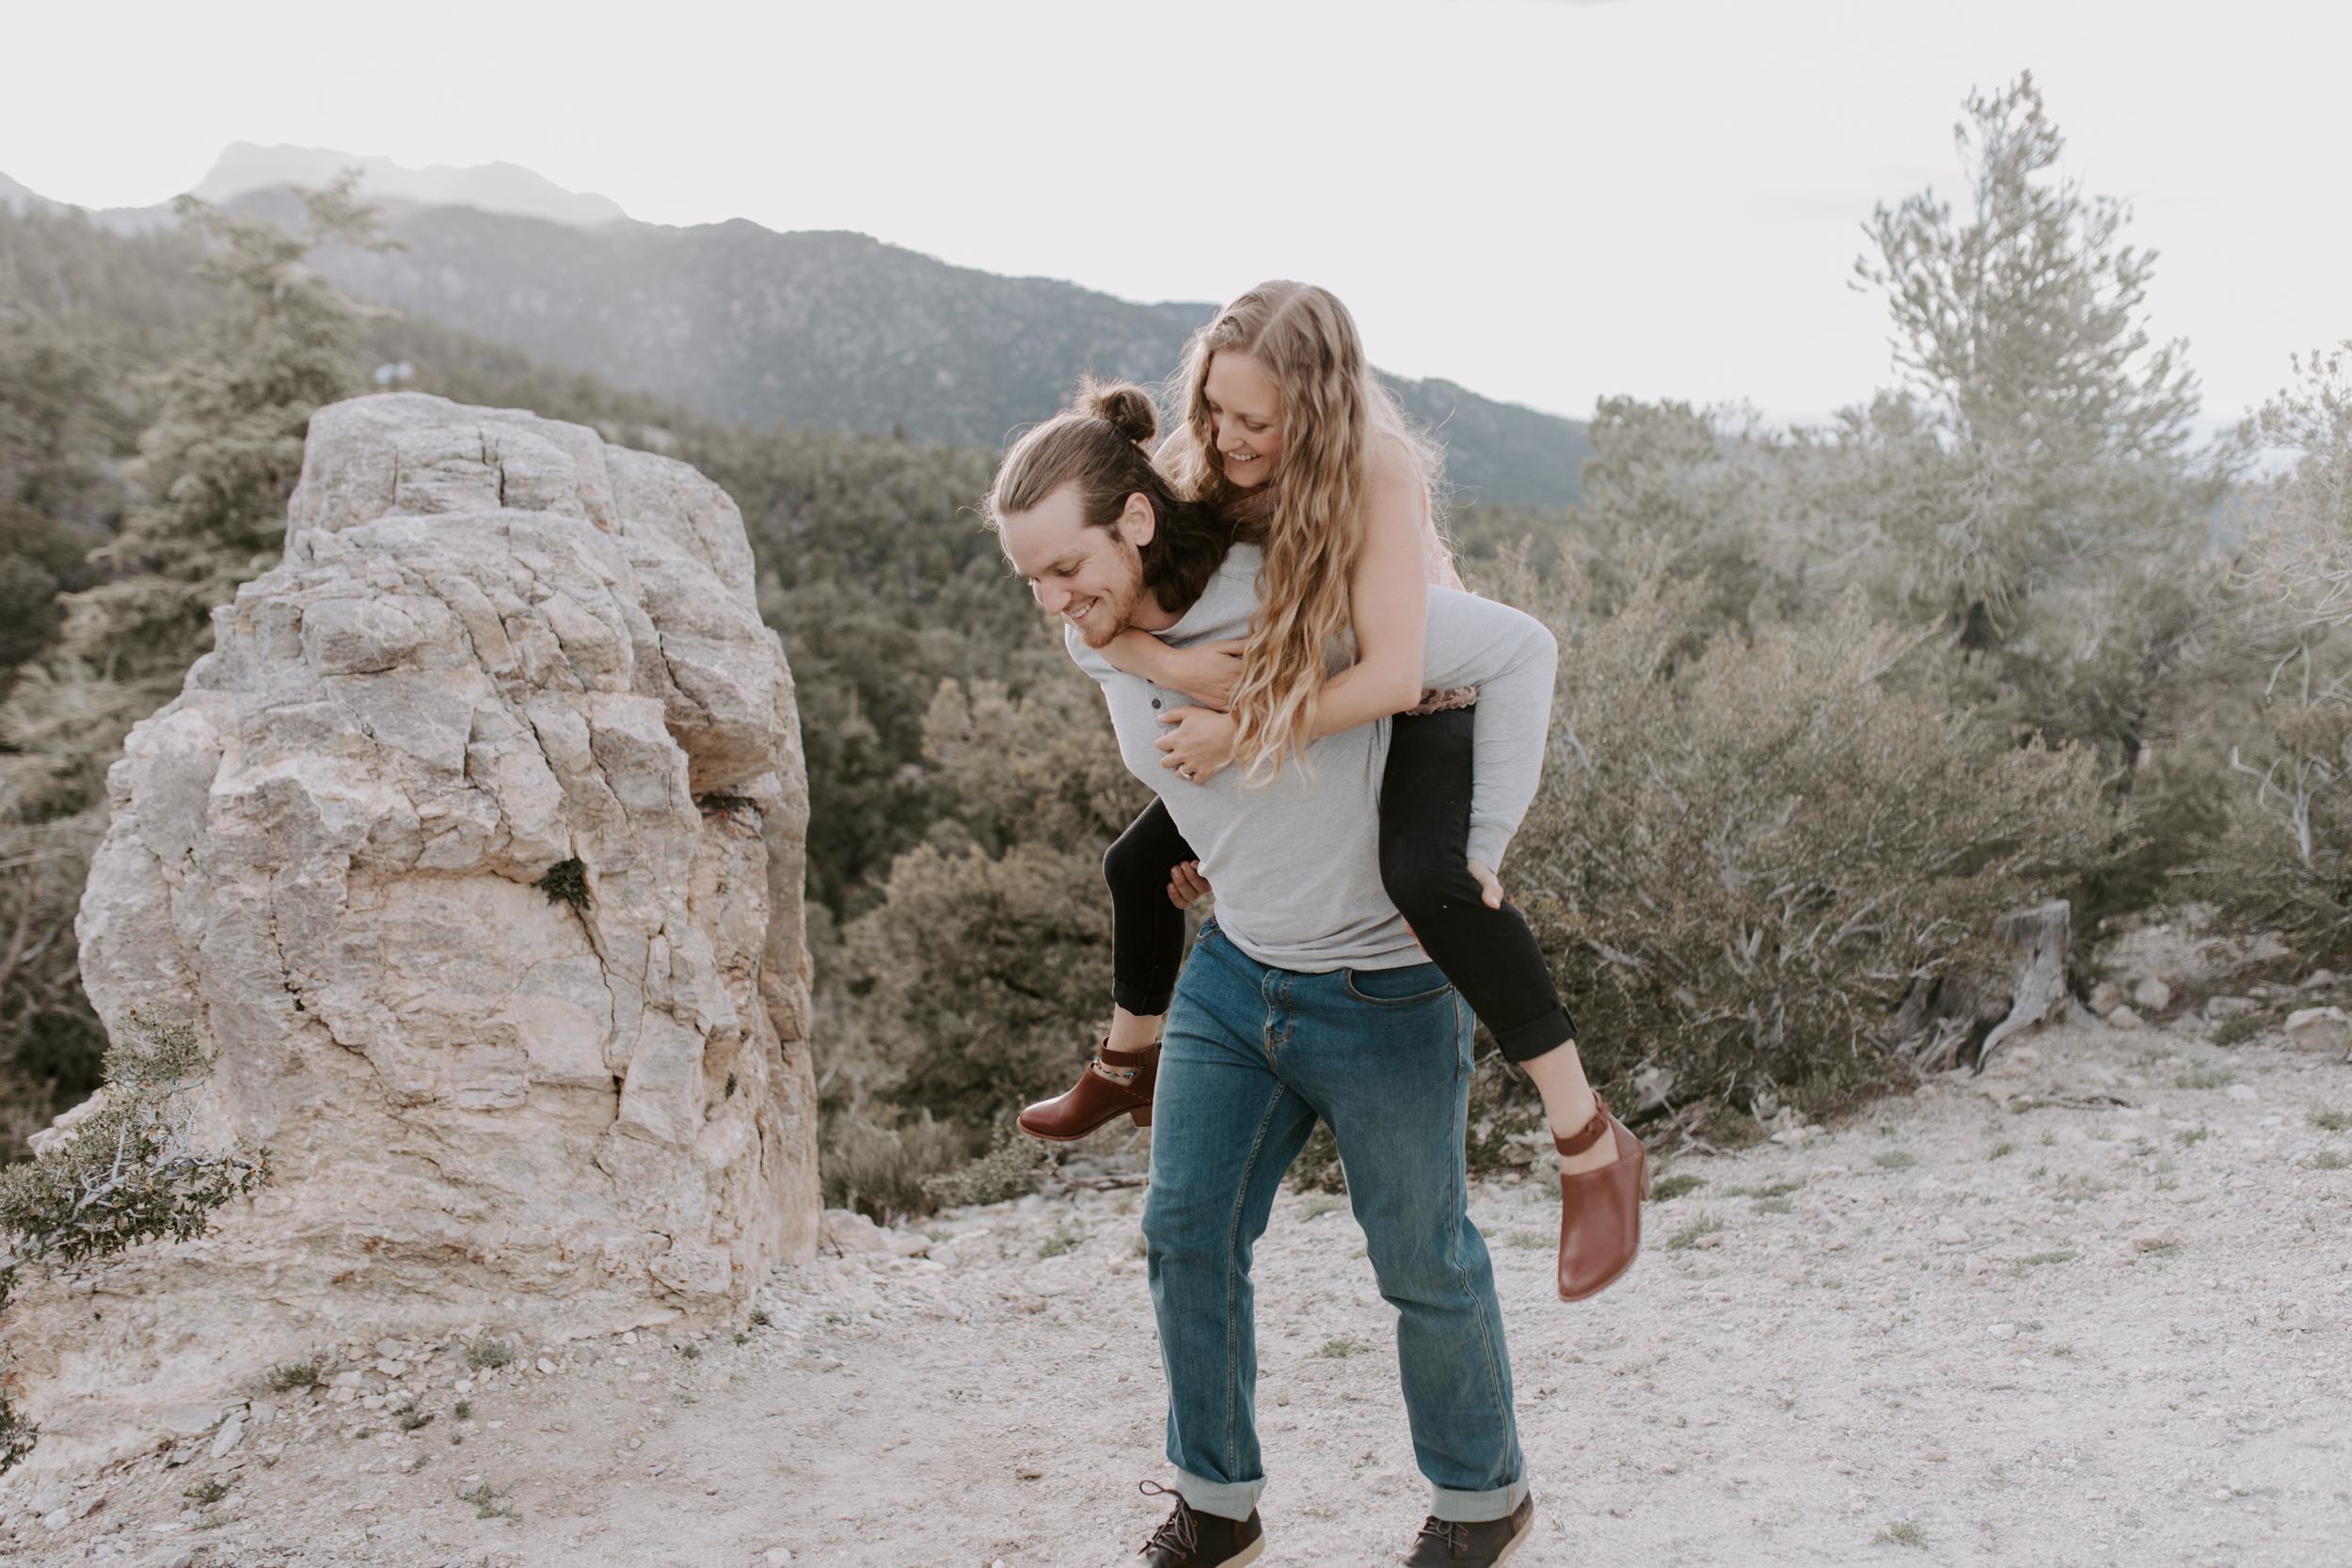 Katelyn Faye Photography | www.katelynfaye.com | Las Vegas Engagement | Mt. Charleston Engagement Session | T&S-23.jpg